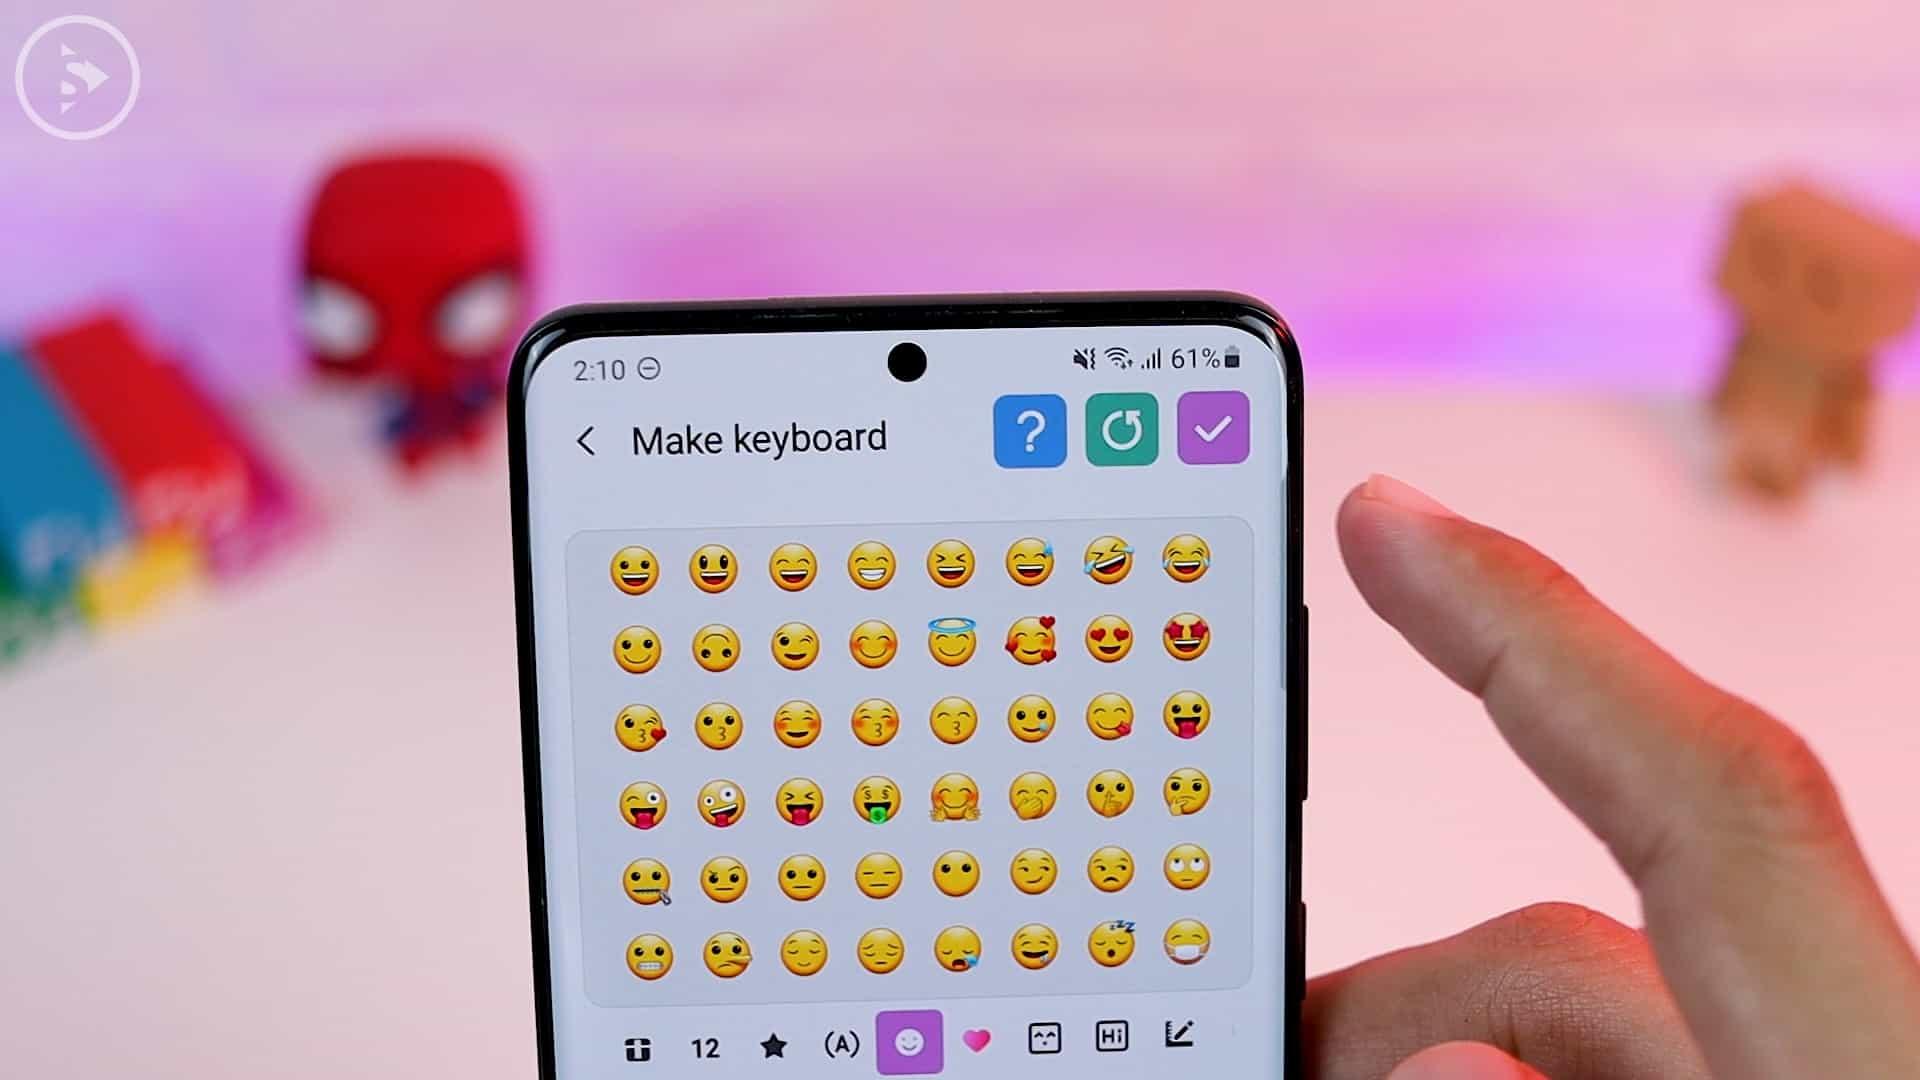 Tips Aplikasi Keys Cafe Terbaru Good Lock - save keyboard yang sudah dikostumisasi